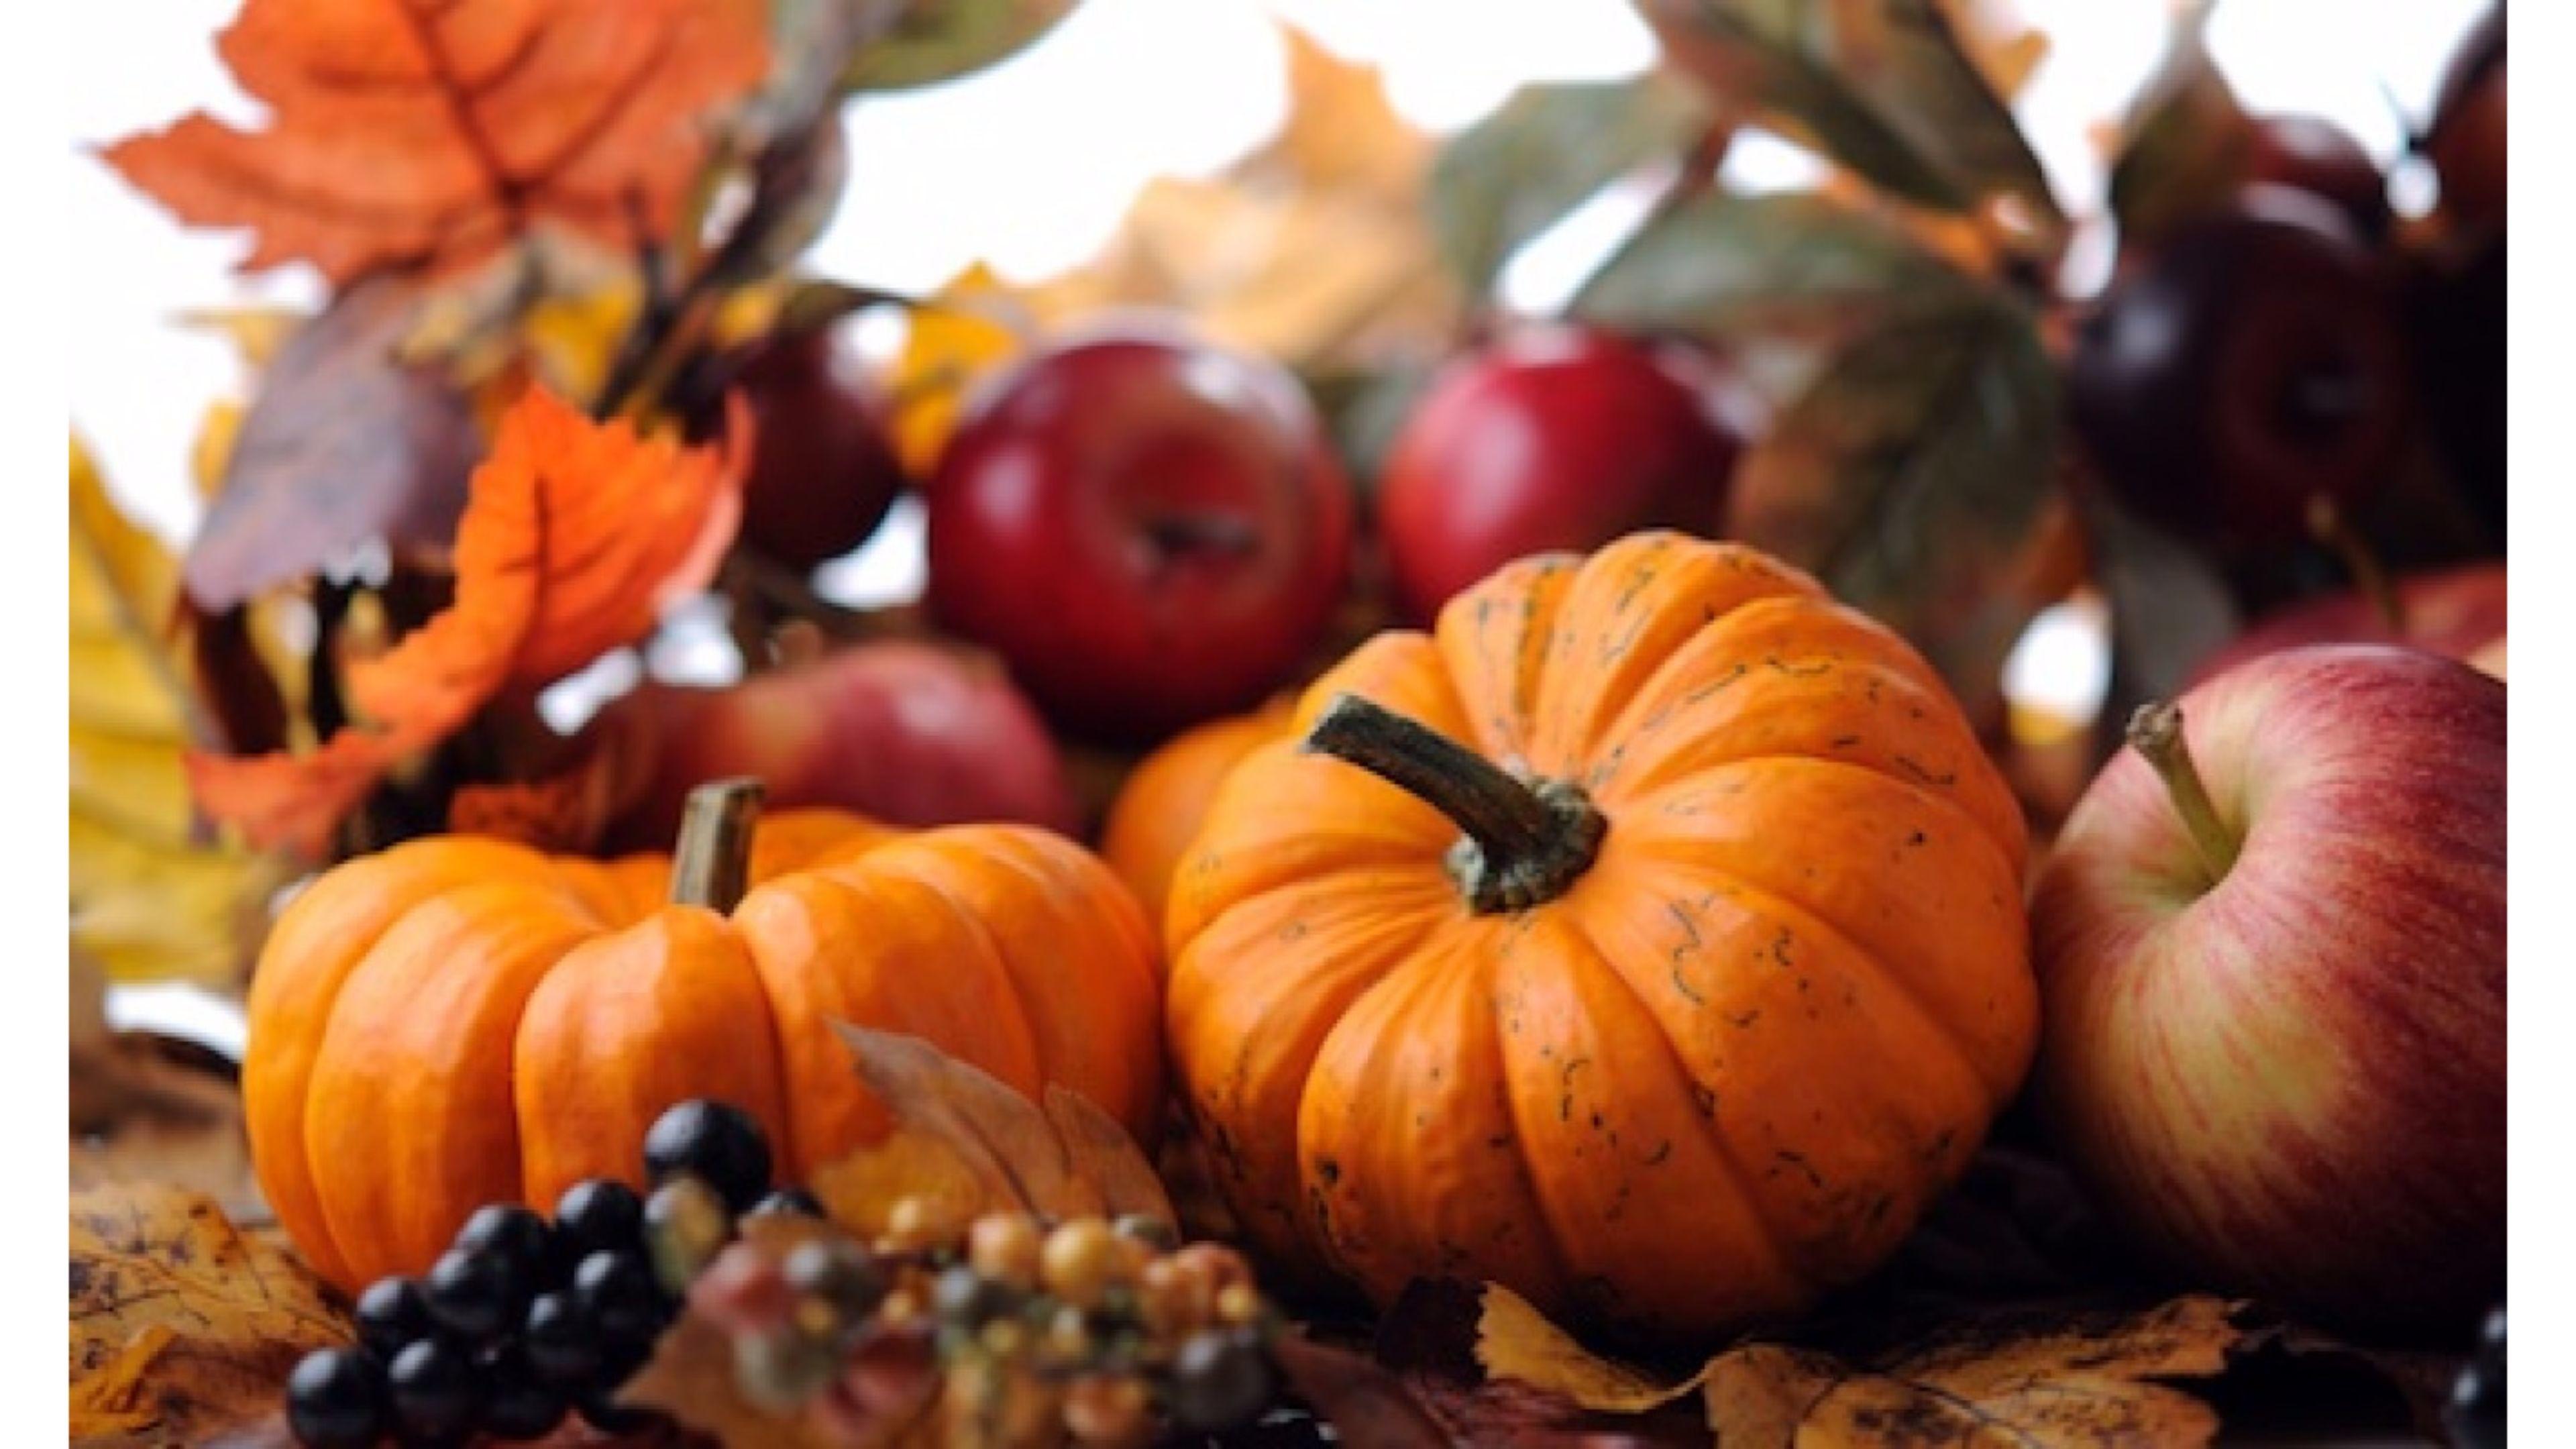 Fall wallpaper backgrounds with pumpkins 55 images - Fall wallpaper pumpkins ...